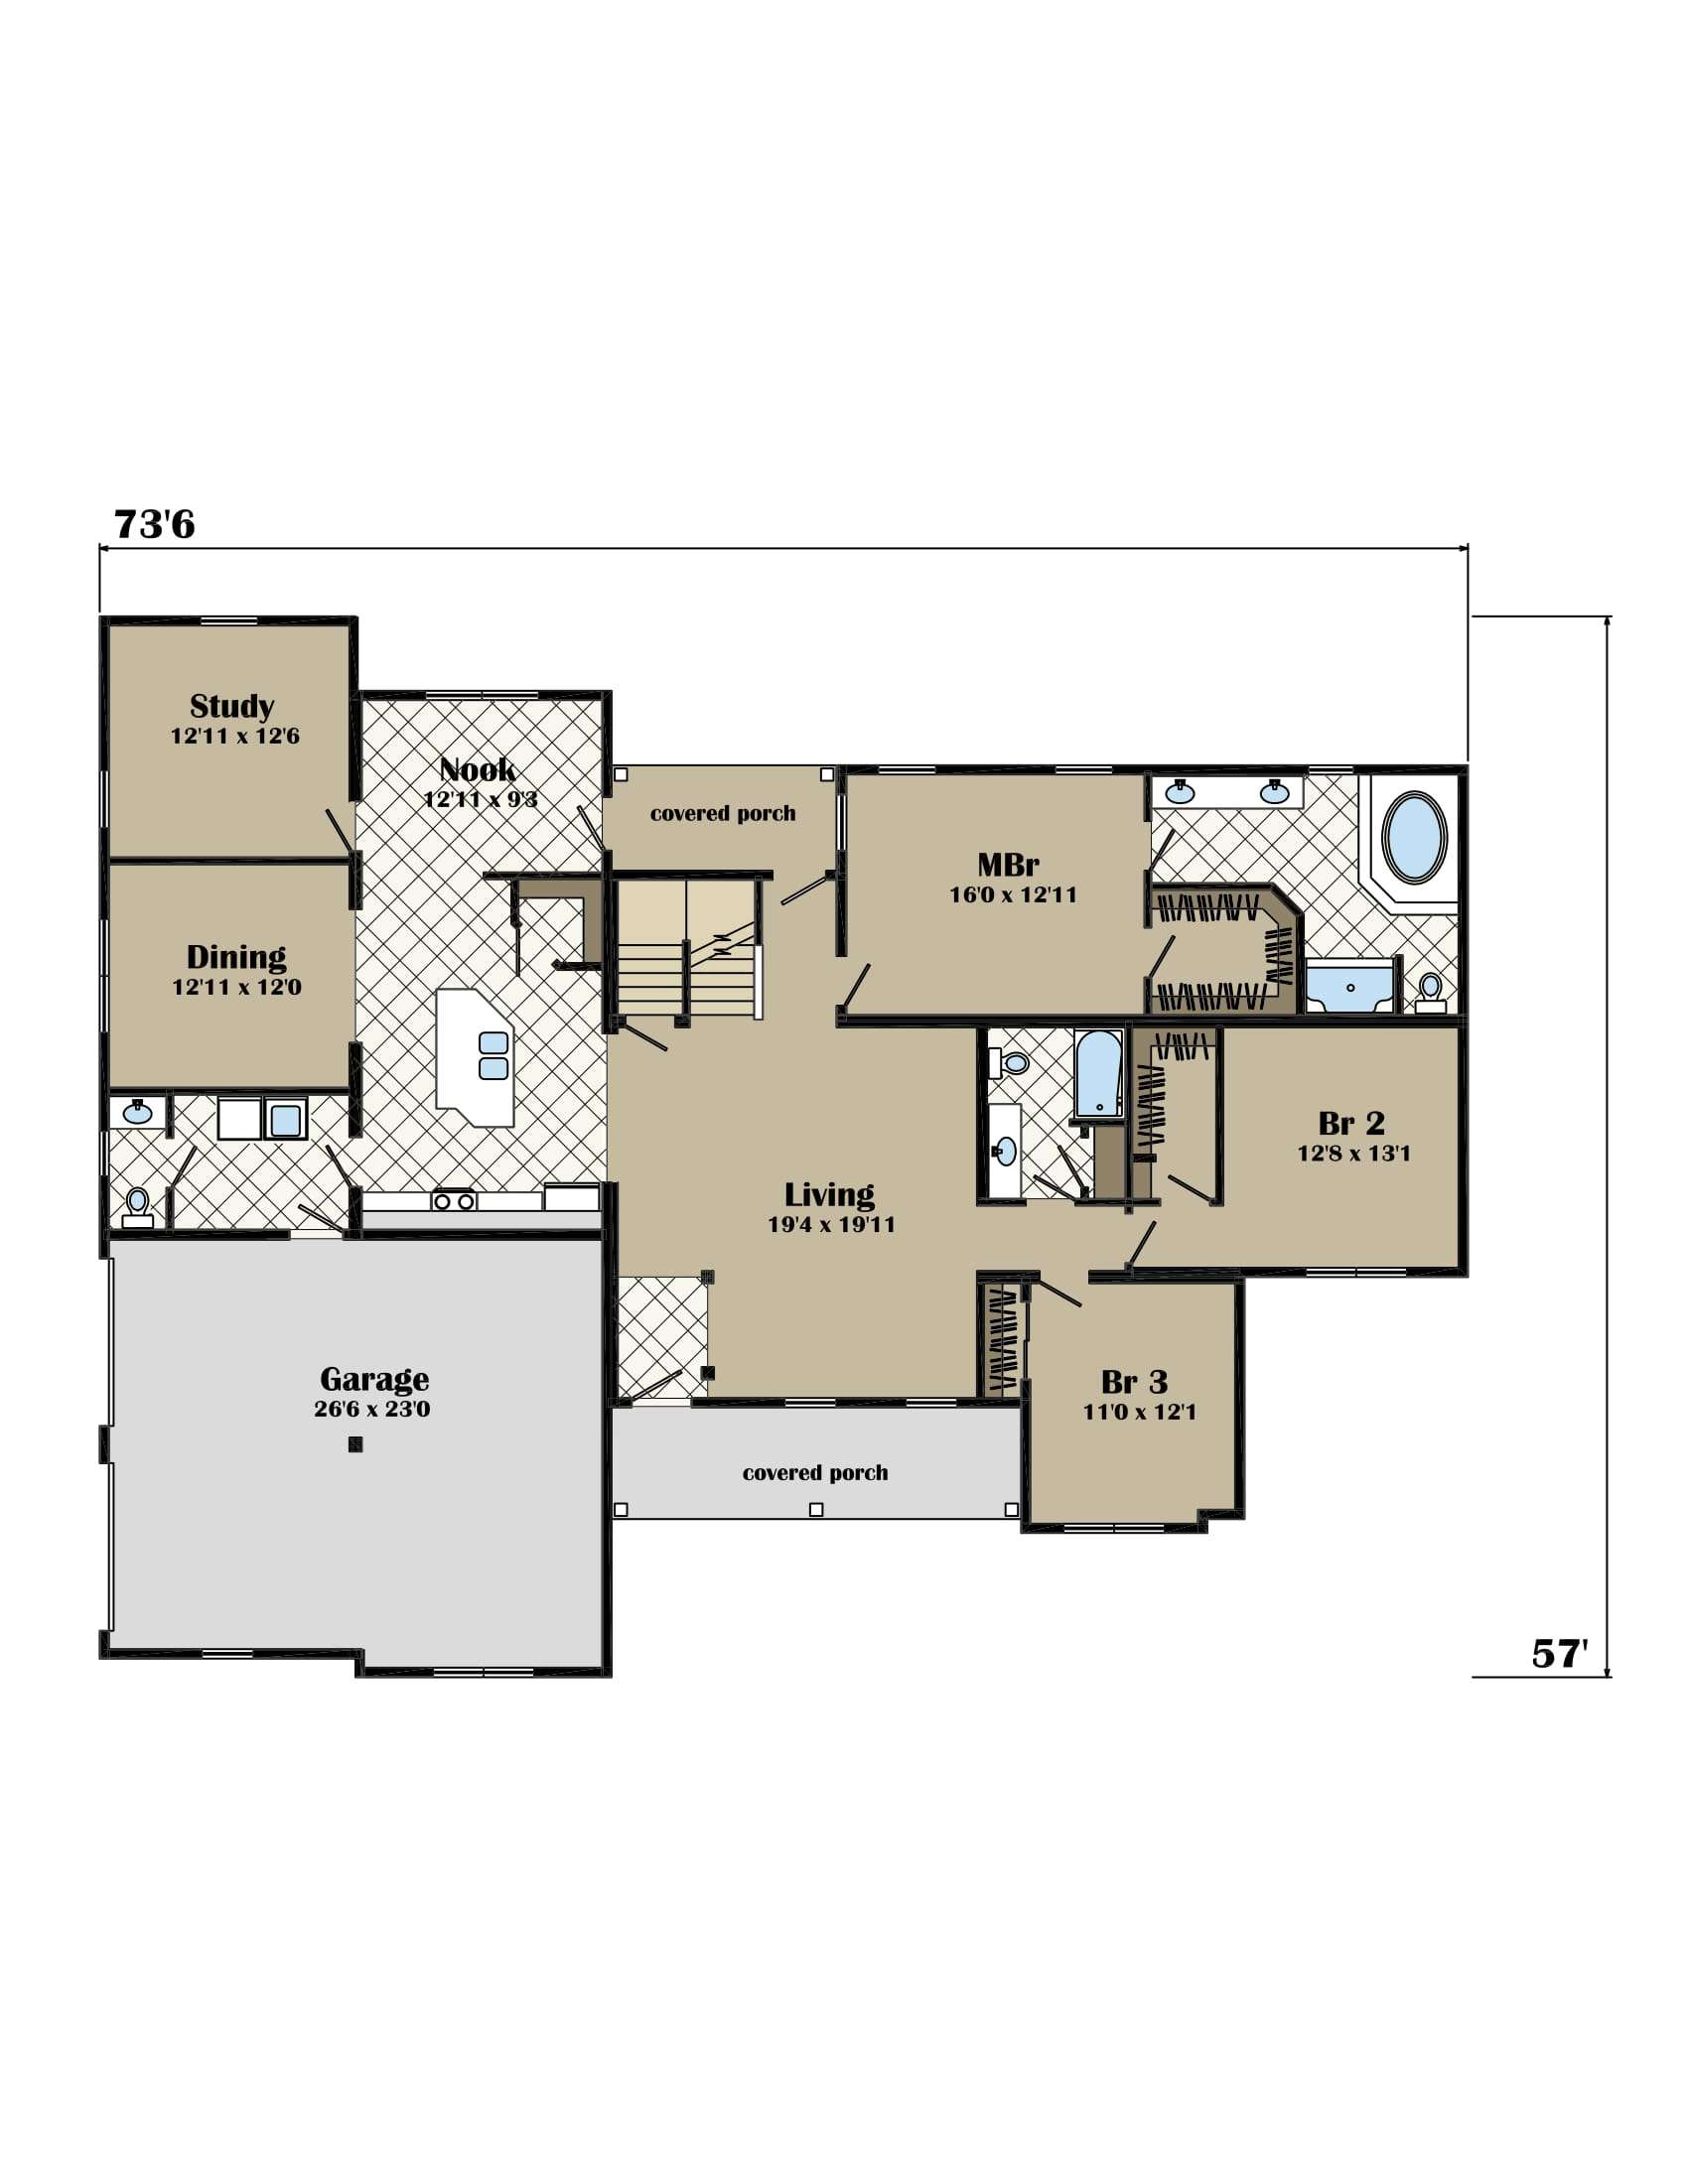 Modular Floor Plans Lincolnton NC, Charlotte, Greensboro, Greenville on show home, home plan, roof plan, green plan, resort plan, show house contract, bedroom plan, garden plan, show house program, show drawing, lighting plan,